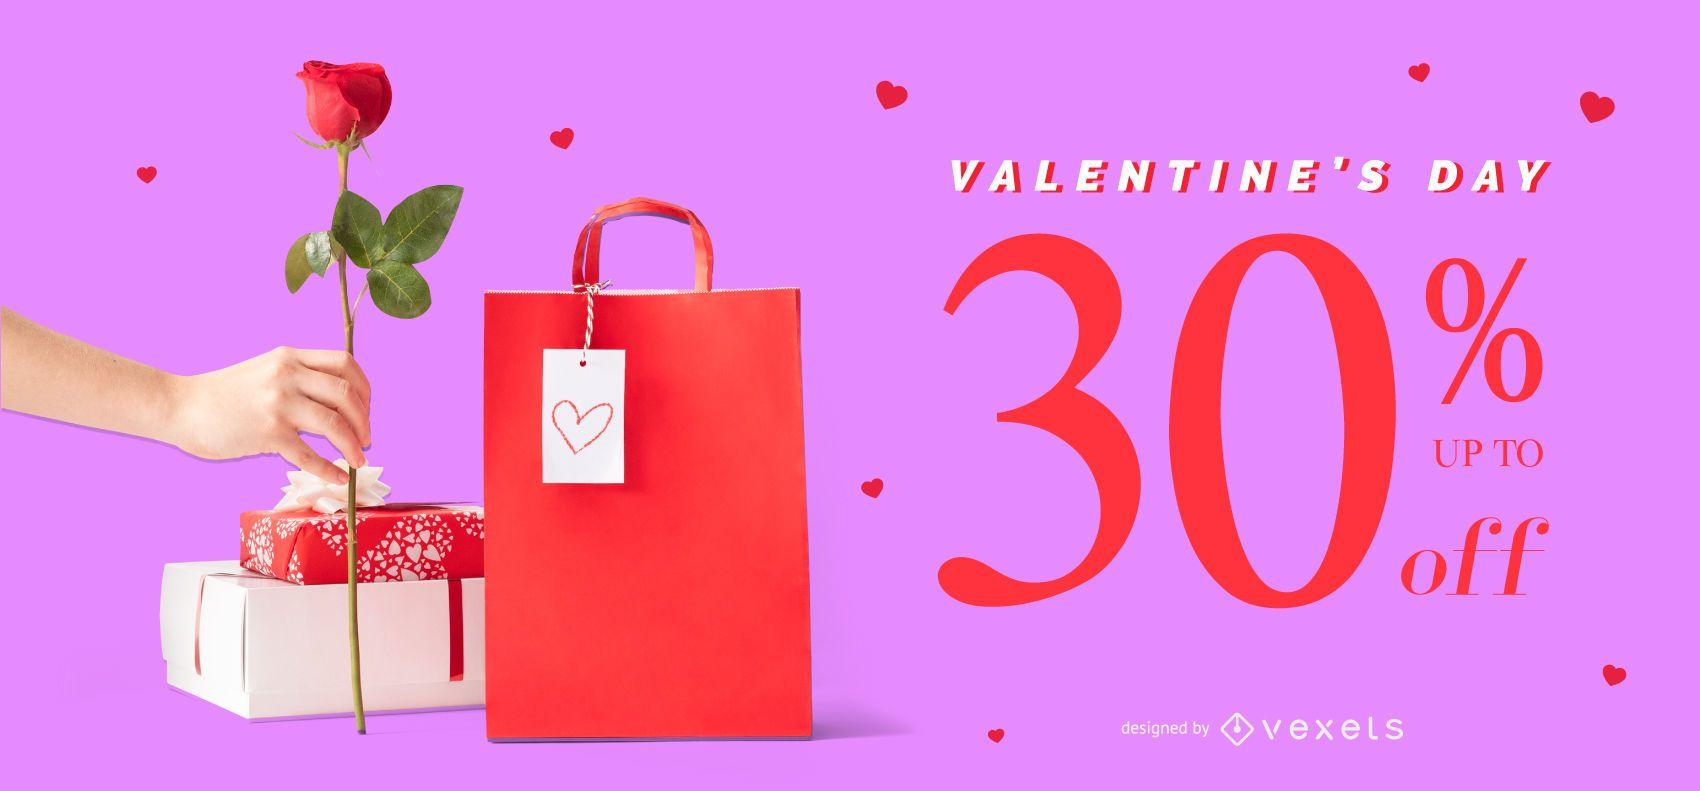 Valentine's day sale slider template